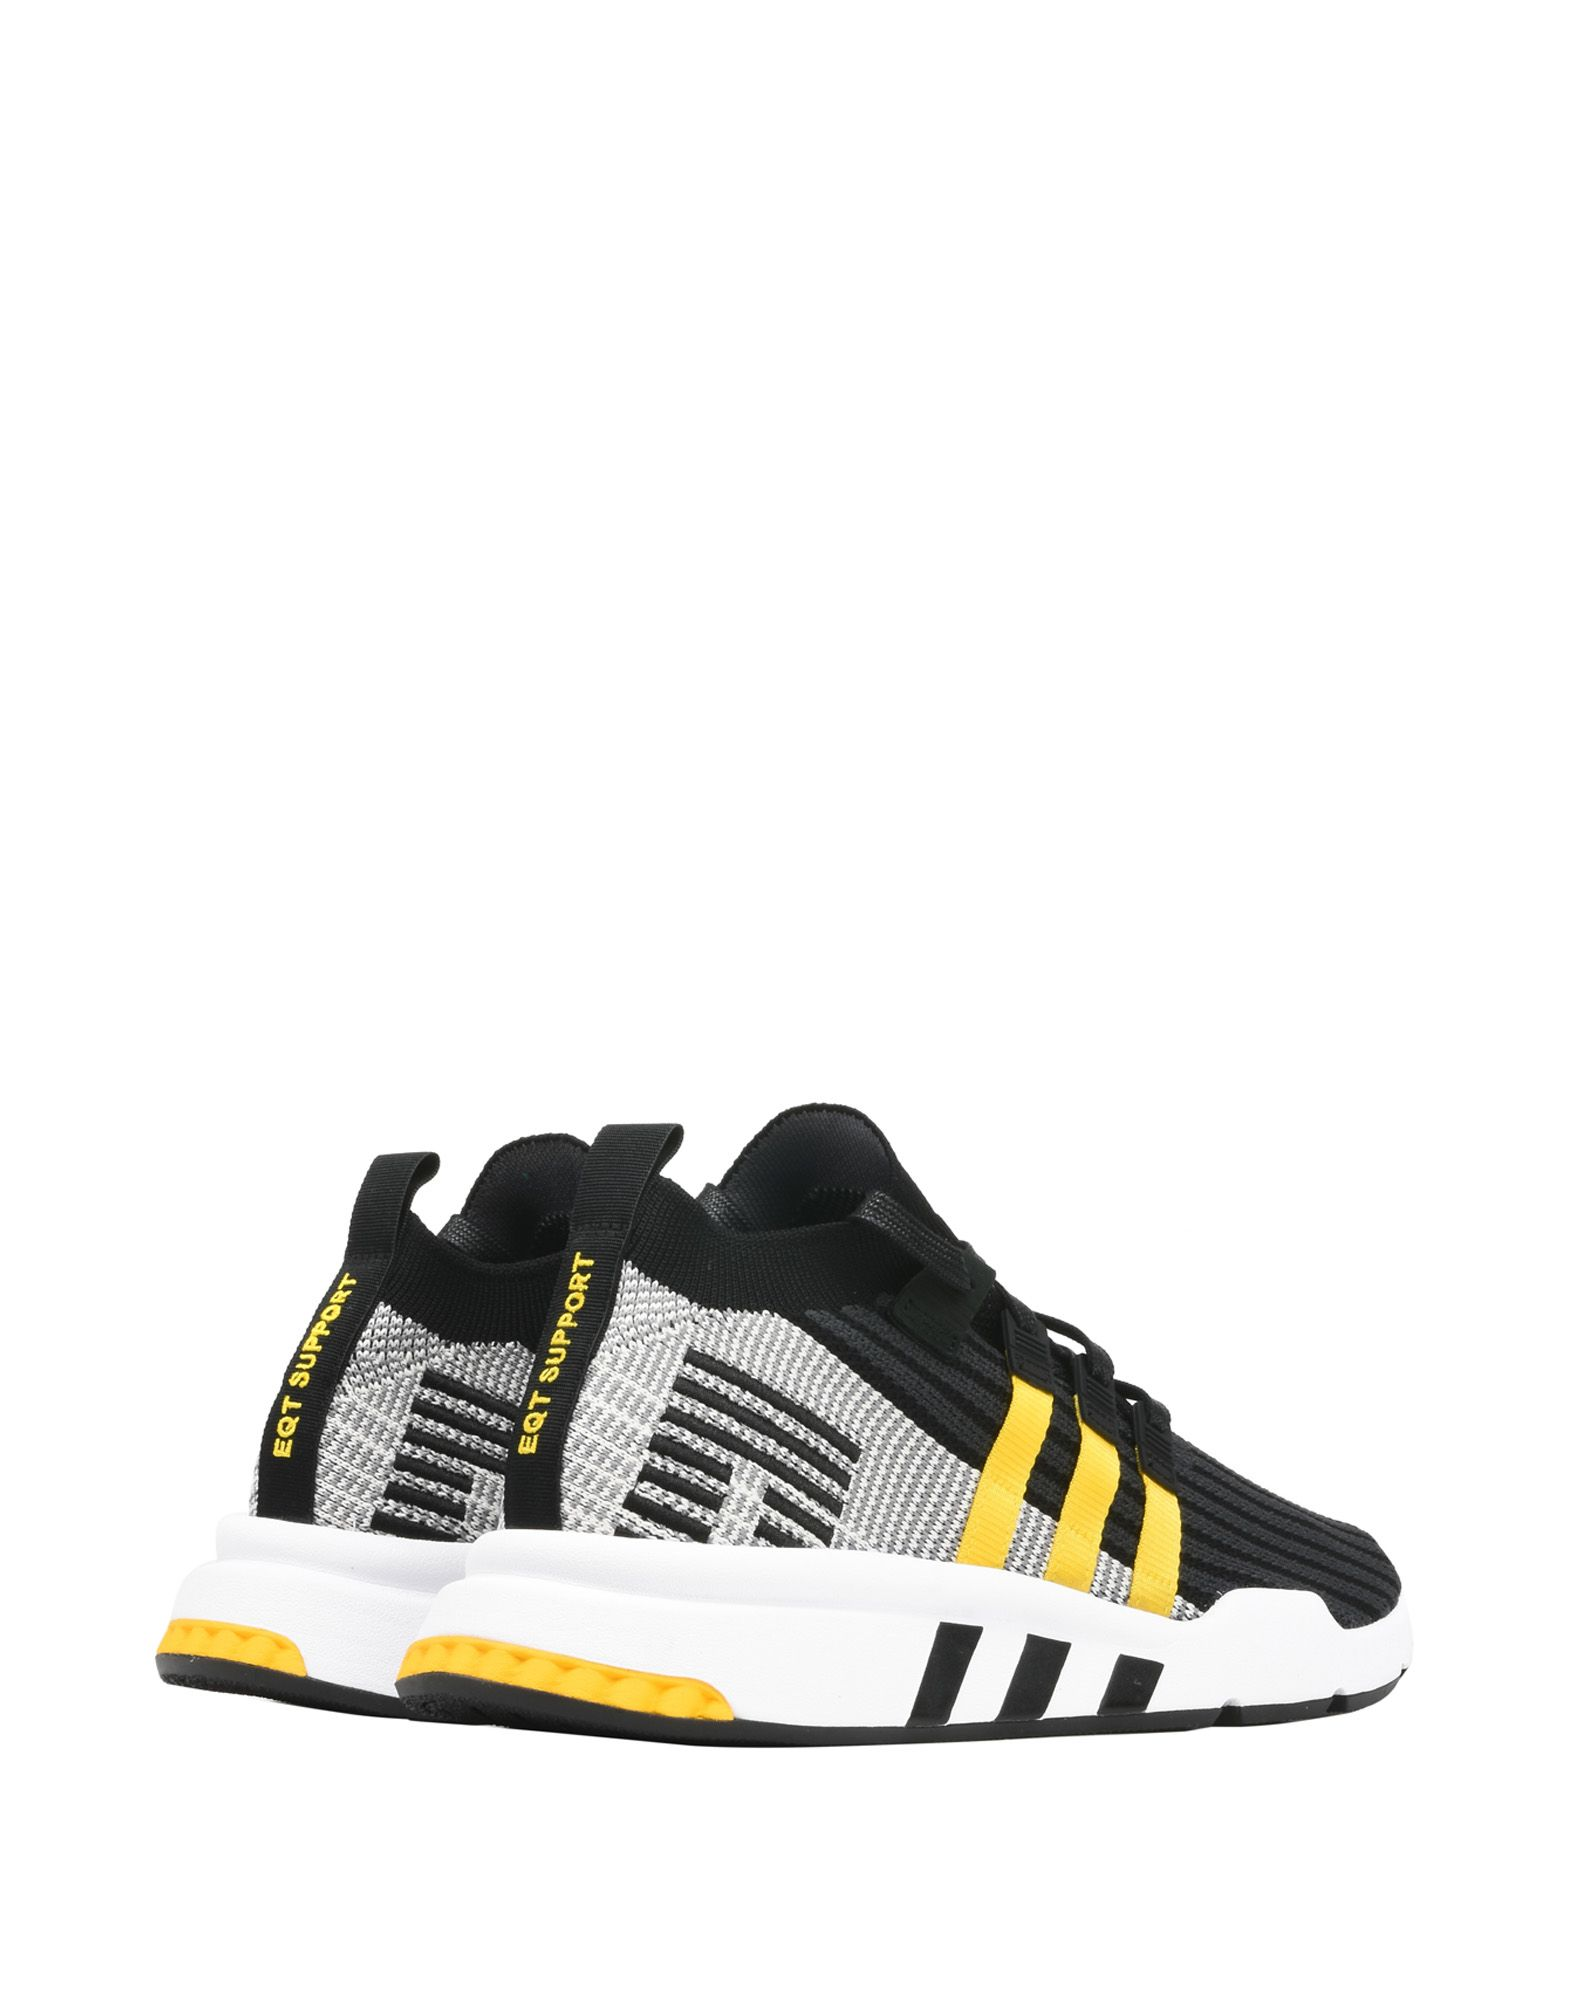 Adidas Originals Eqt Support Mid Adv  Schuhe 11480995WG Gute Qualität beliebte Schuhe  015605